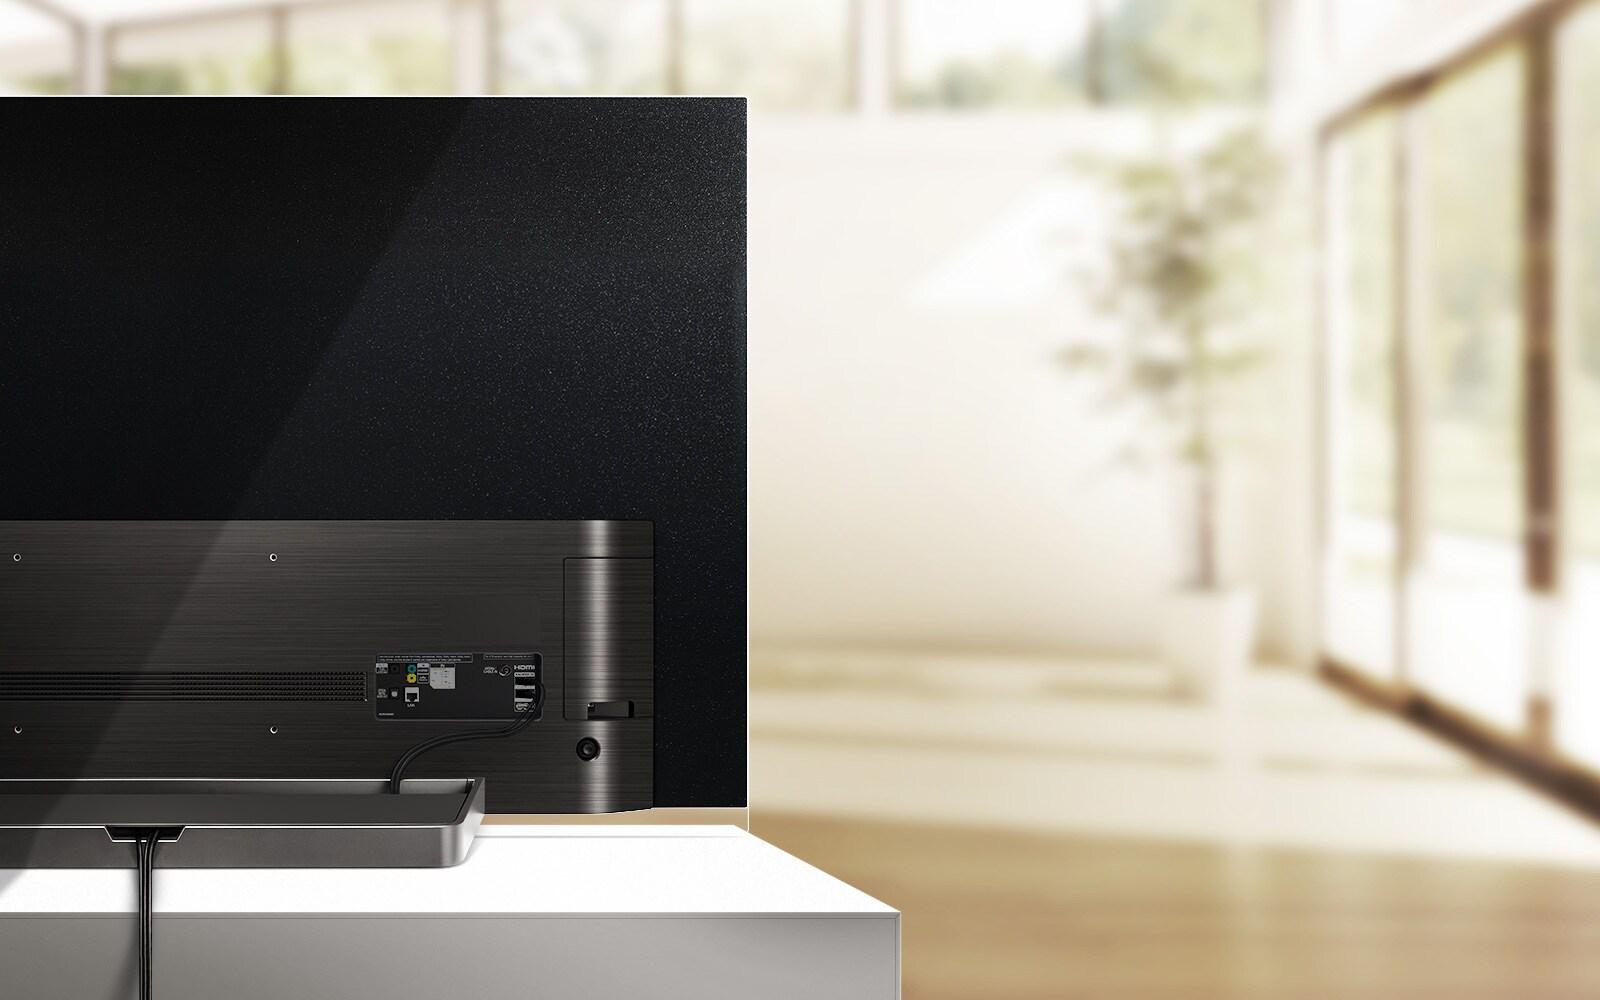 TV-OLED-E9-07-Cable-Management-Desktop